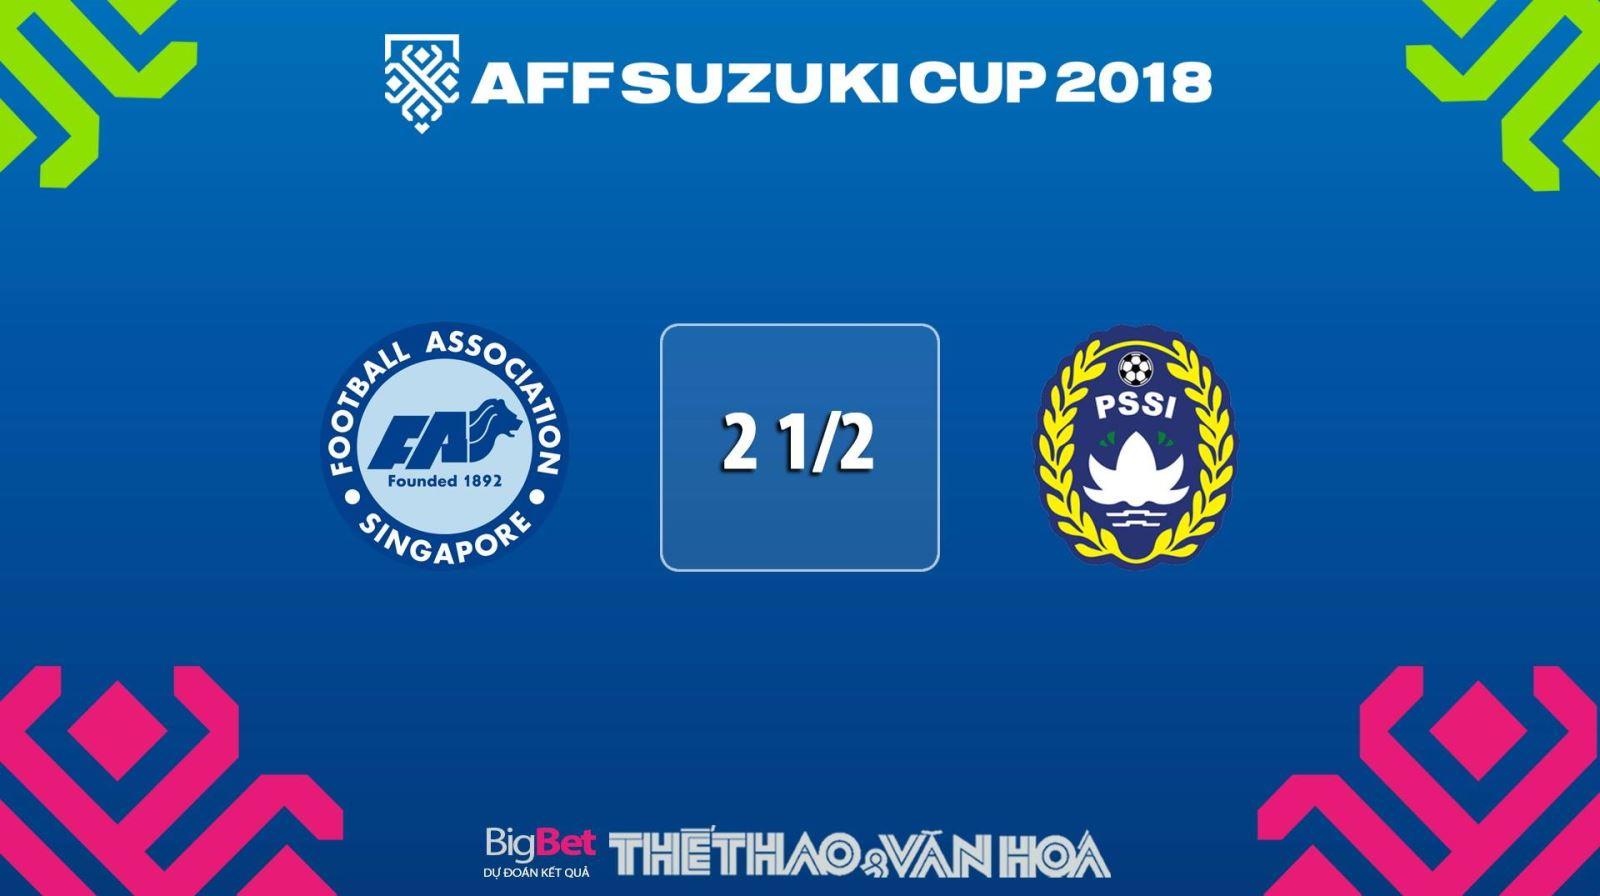 AFF Suzuki Cup 2018, AFF Cup, AFF Cup 2018, lịch thi đấu AFF Cup 2018, trực tiếp AFF Cup 2018, soi kèo AFF Cup 2018, nhận định AFF Cup 2018